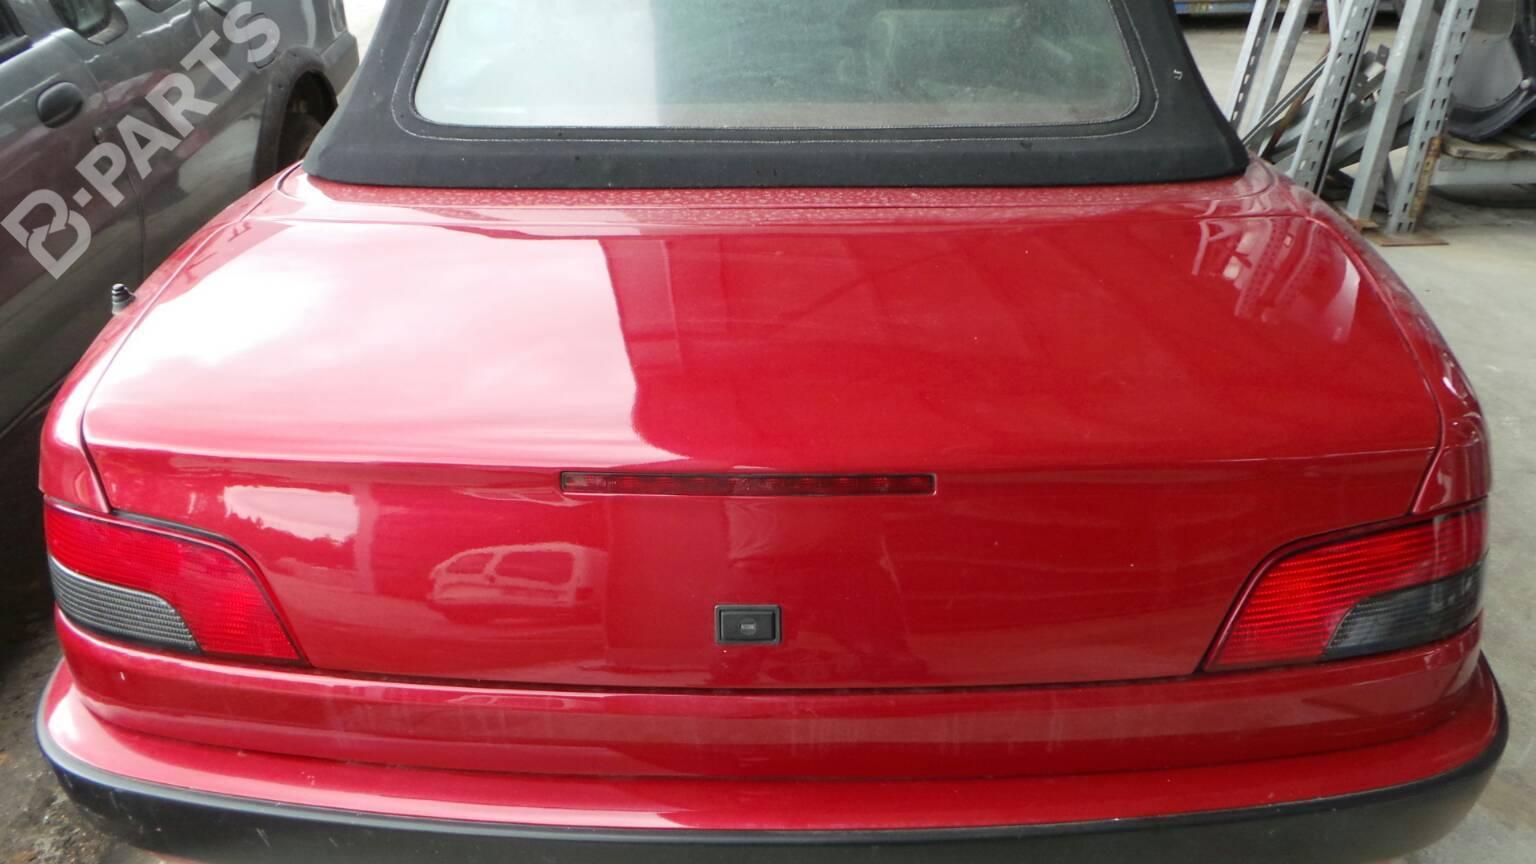 Tailgate Peugeot 306 Convertible 7d N3 N5 18 128673 Fuse Box Brake Lights 182 Doors